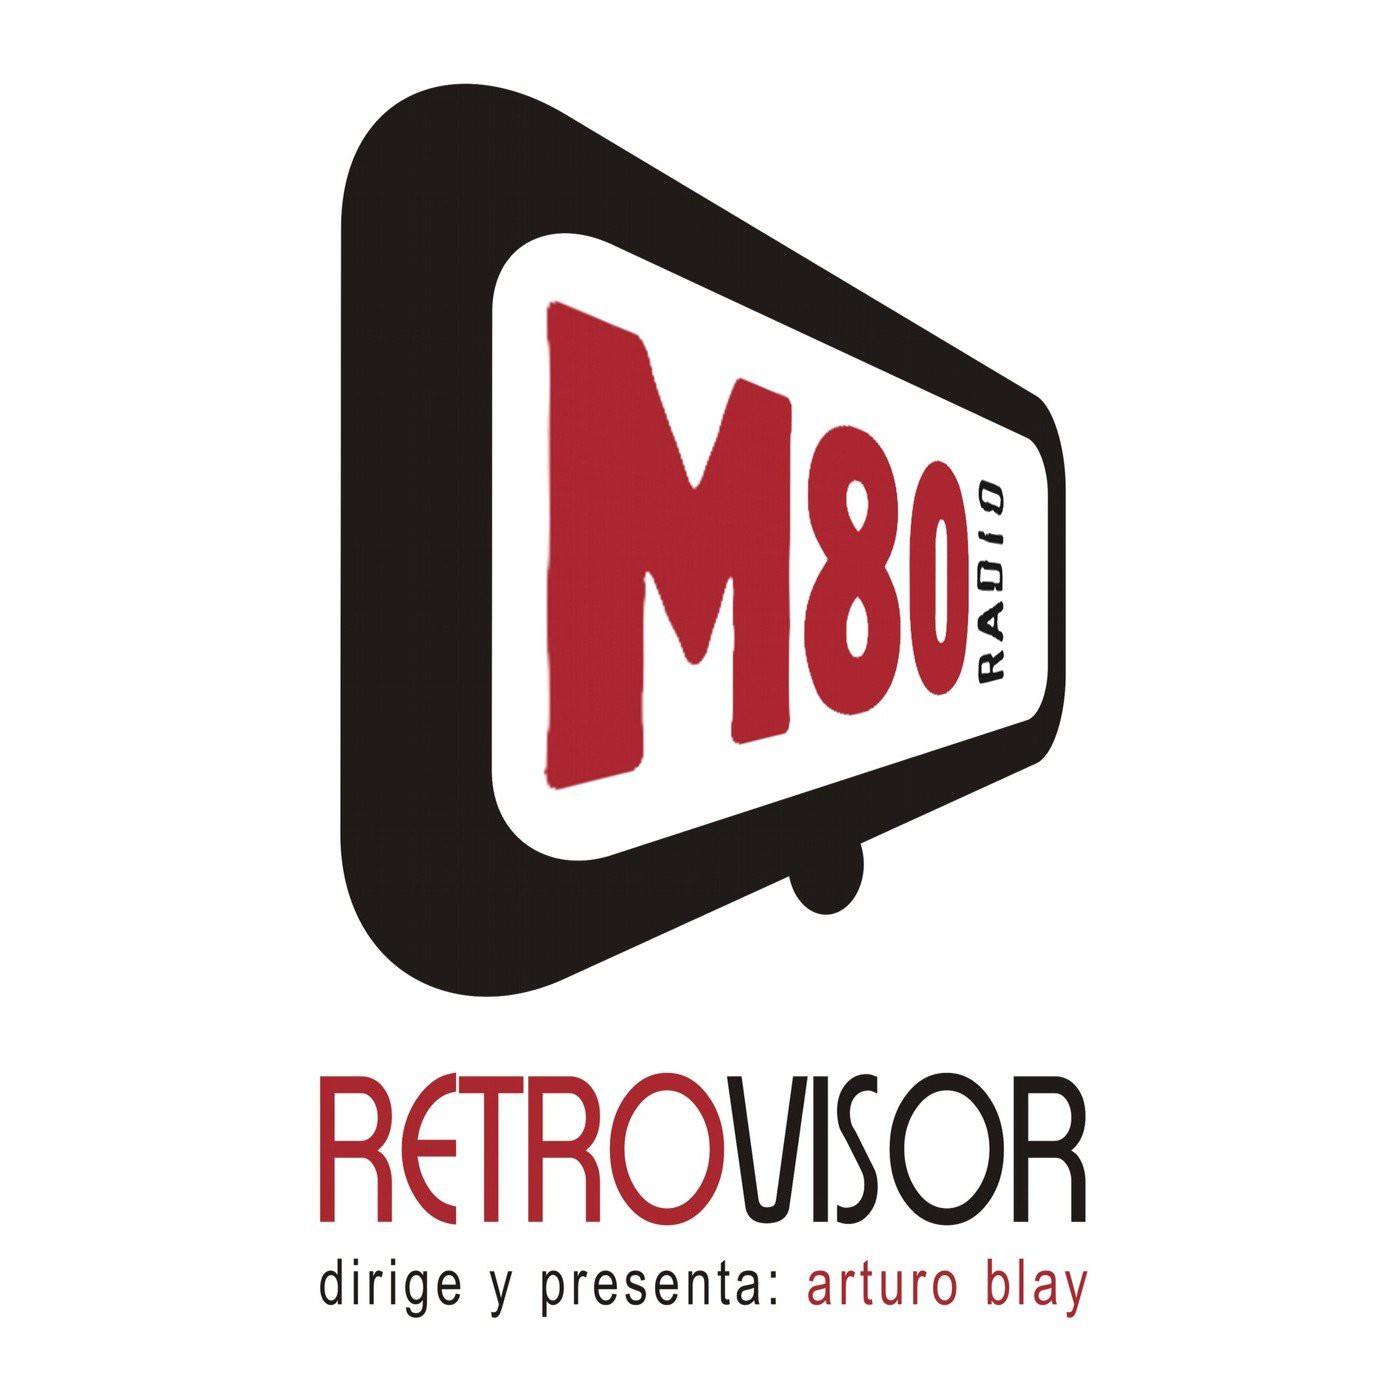 RETROVISOR - M80 Radio